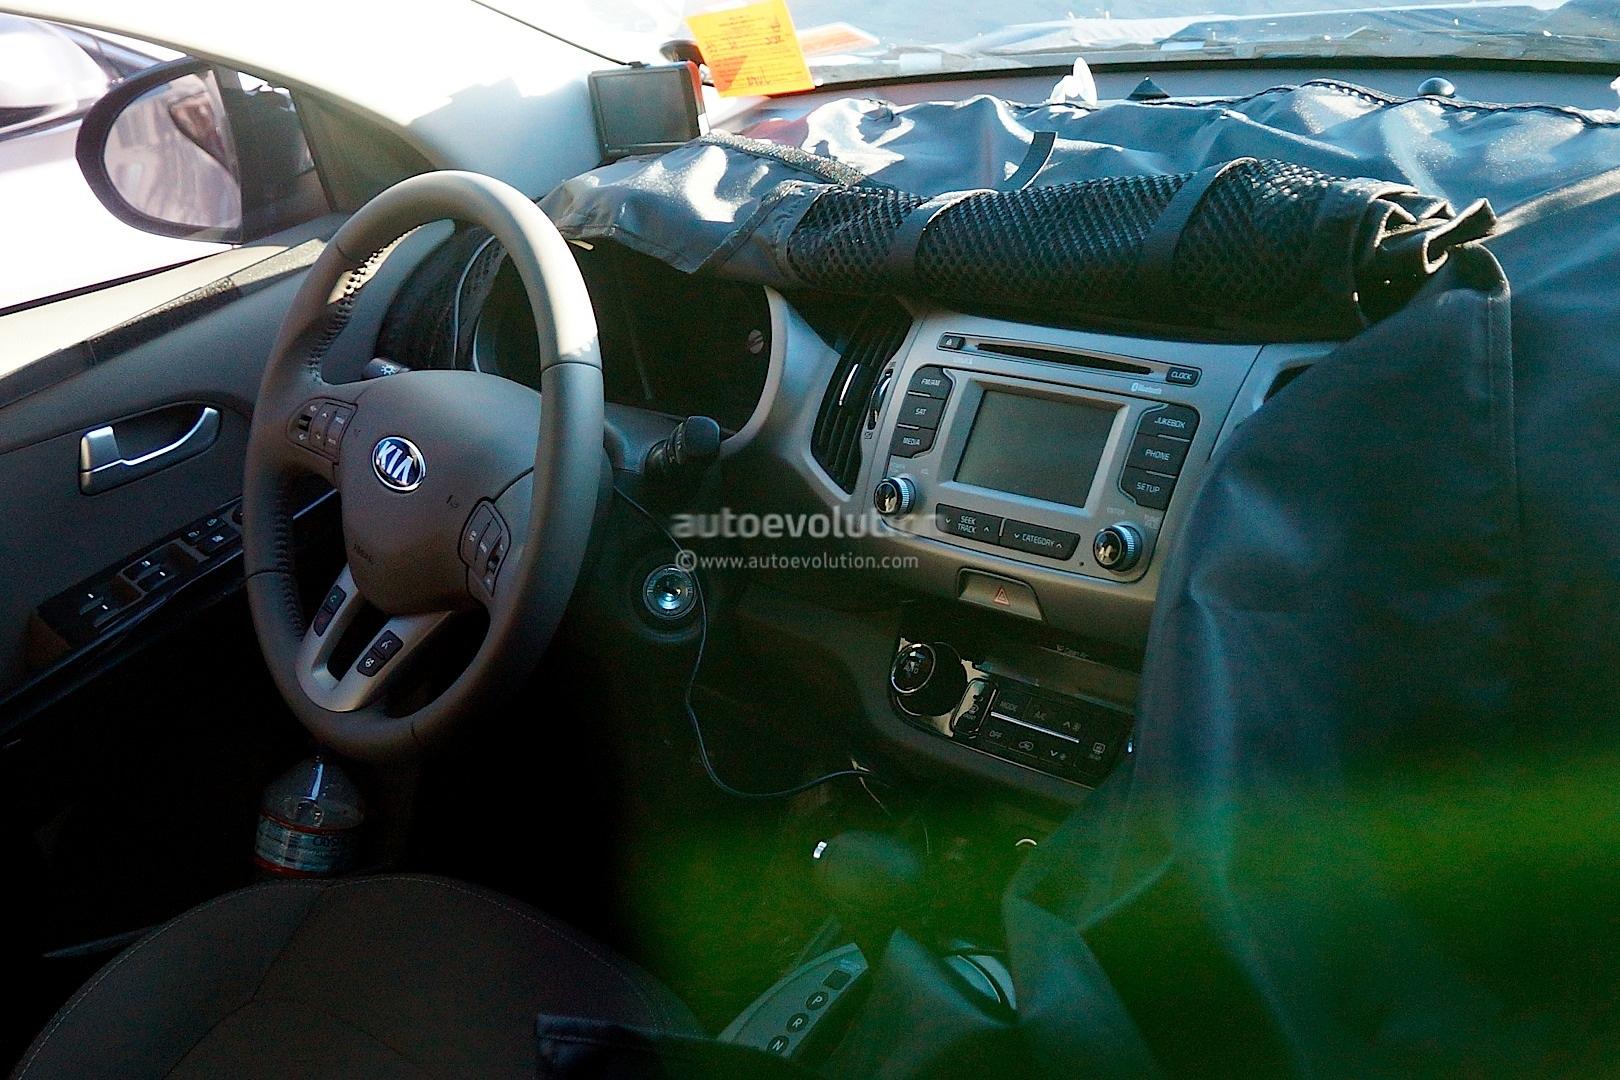 Spyshots 2014 Kia Sportage Facelift Gets Revised Interior